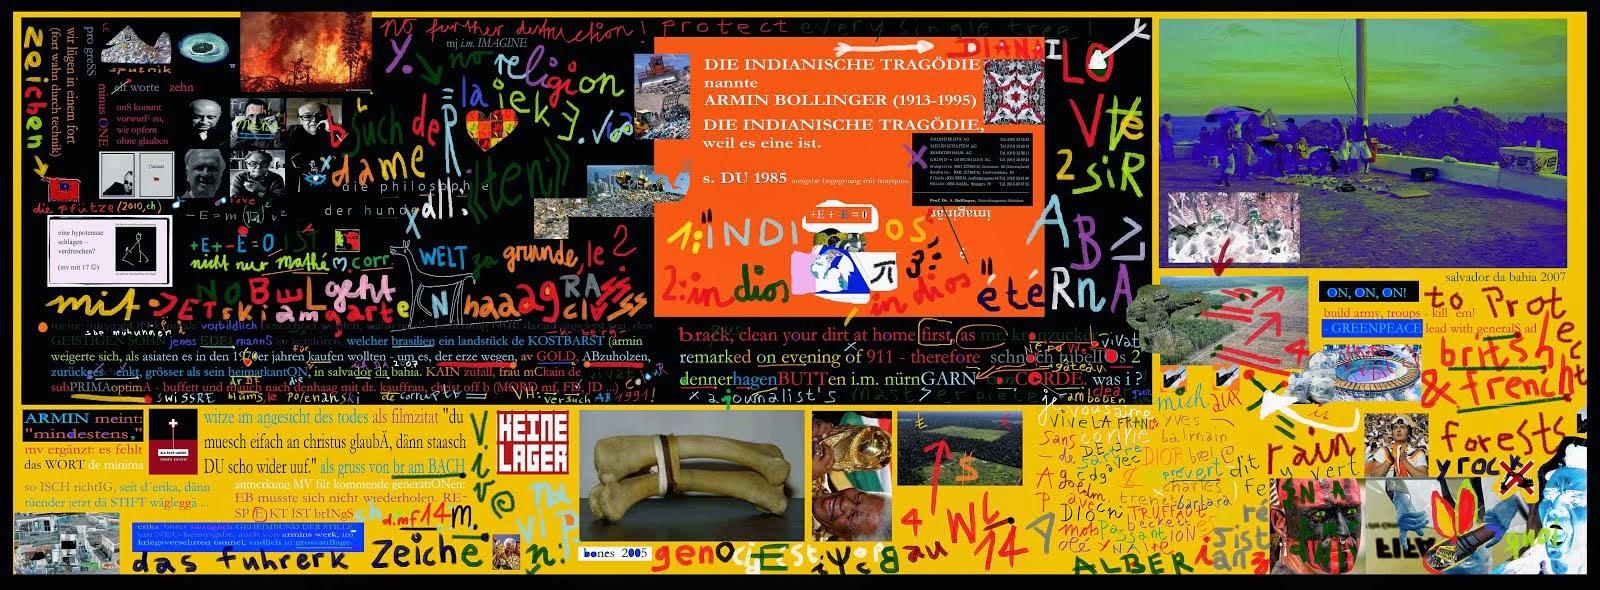 FIFA apartheid wc 2010 - mandela - brazil rainforest - protection prince harry - cw - cyberwar